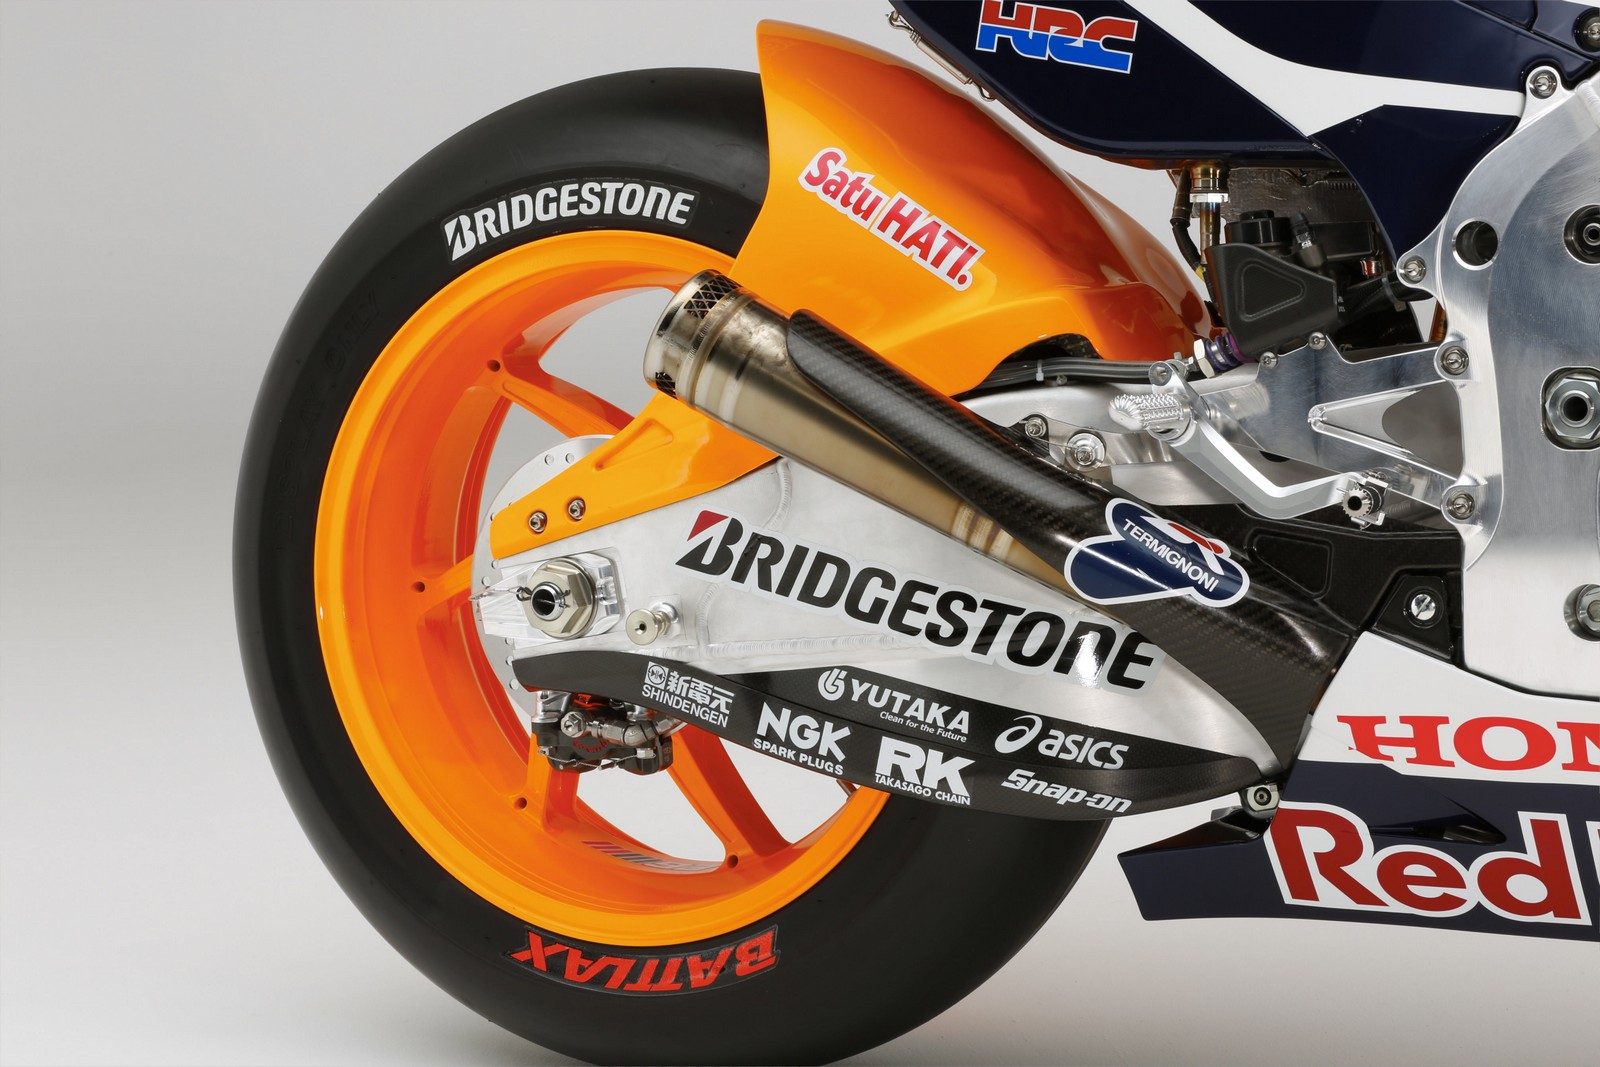 RC213V 2015, Repsol Honda MotoGP